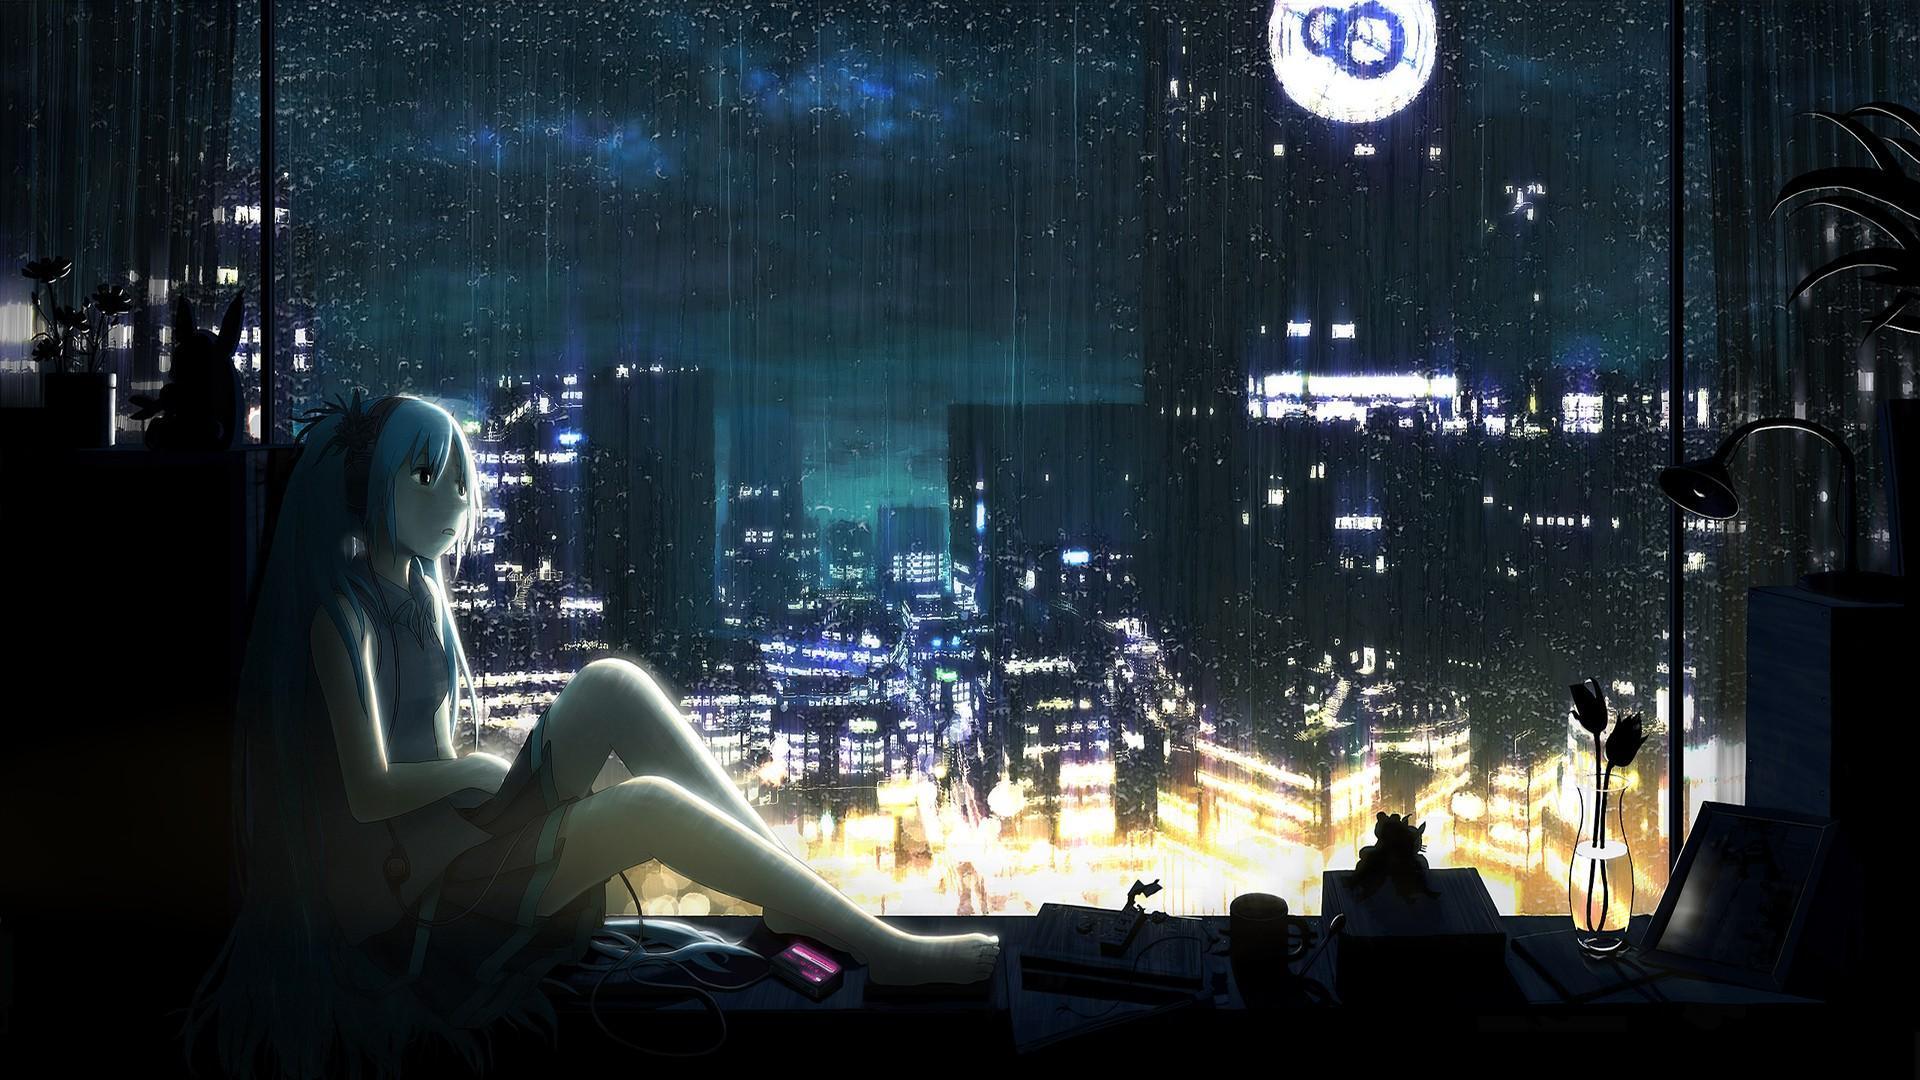 Rain Anime Wallpapers - Wallpaper Cave